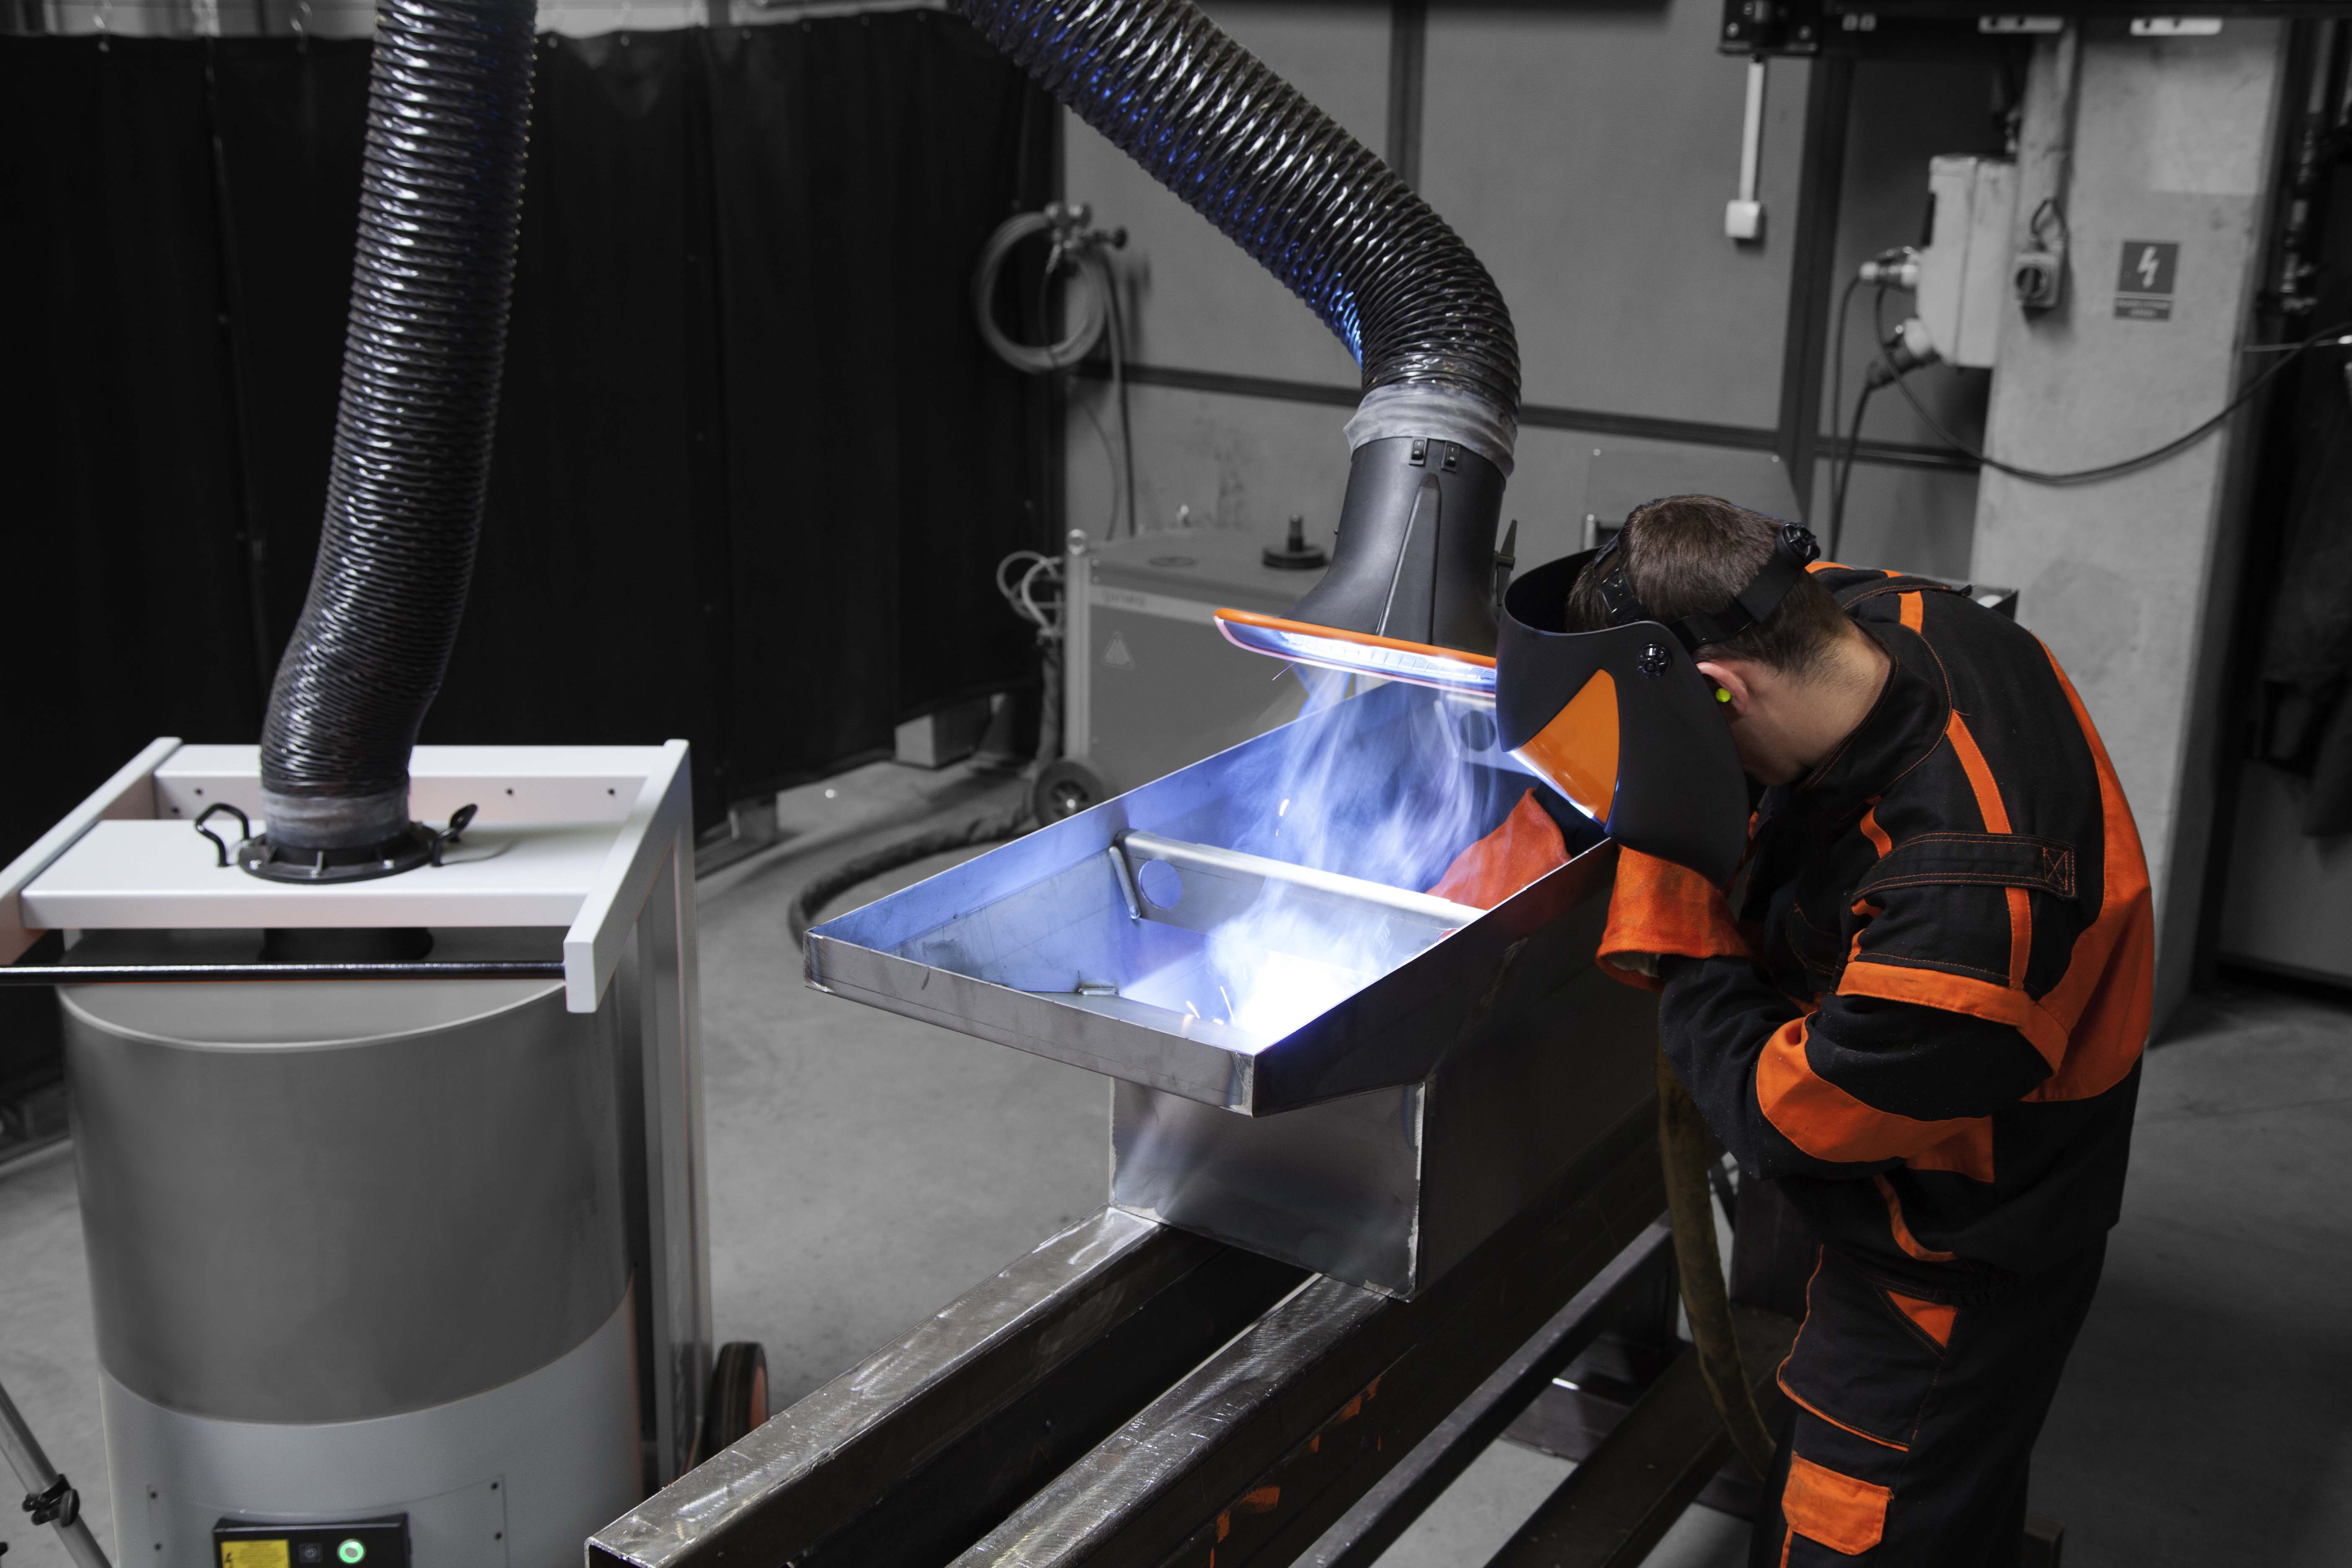 Air return system during chrome-nickel-steel welding works